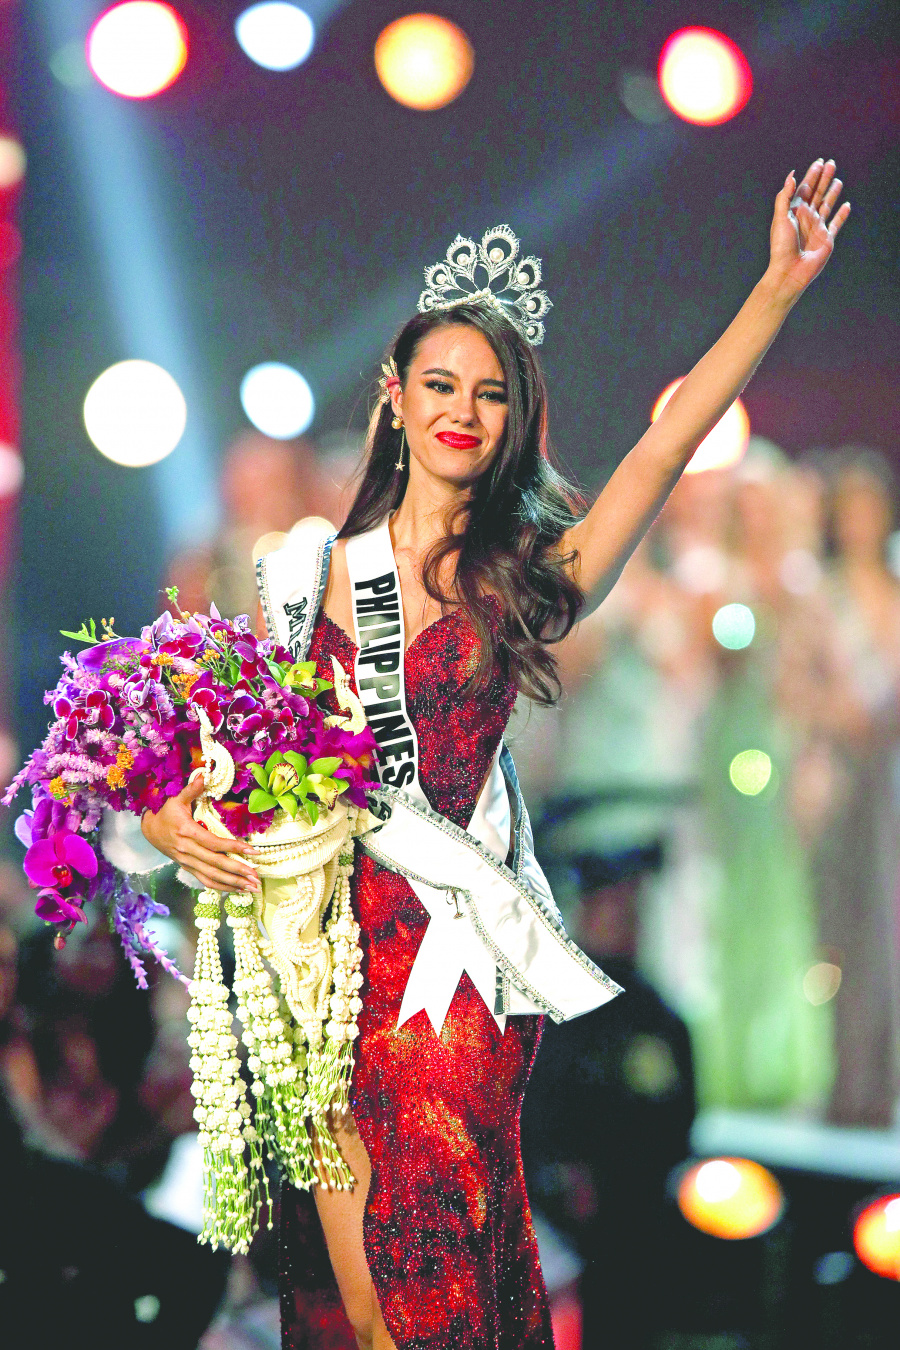 Por cuarta vez, filipina reina en Miss Universo